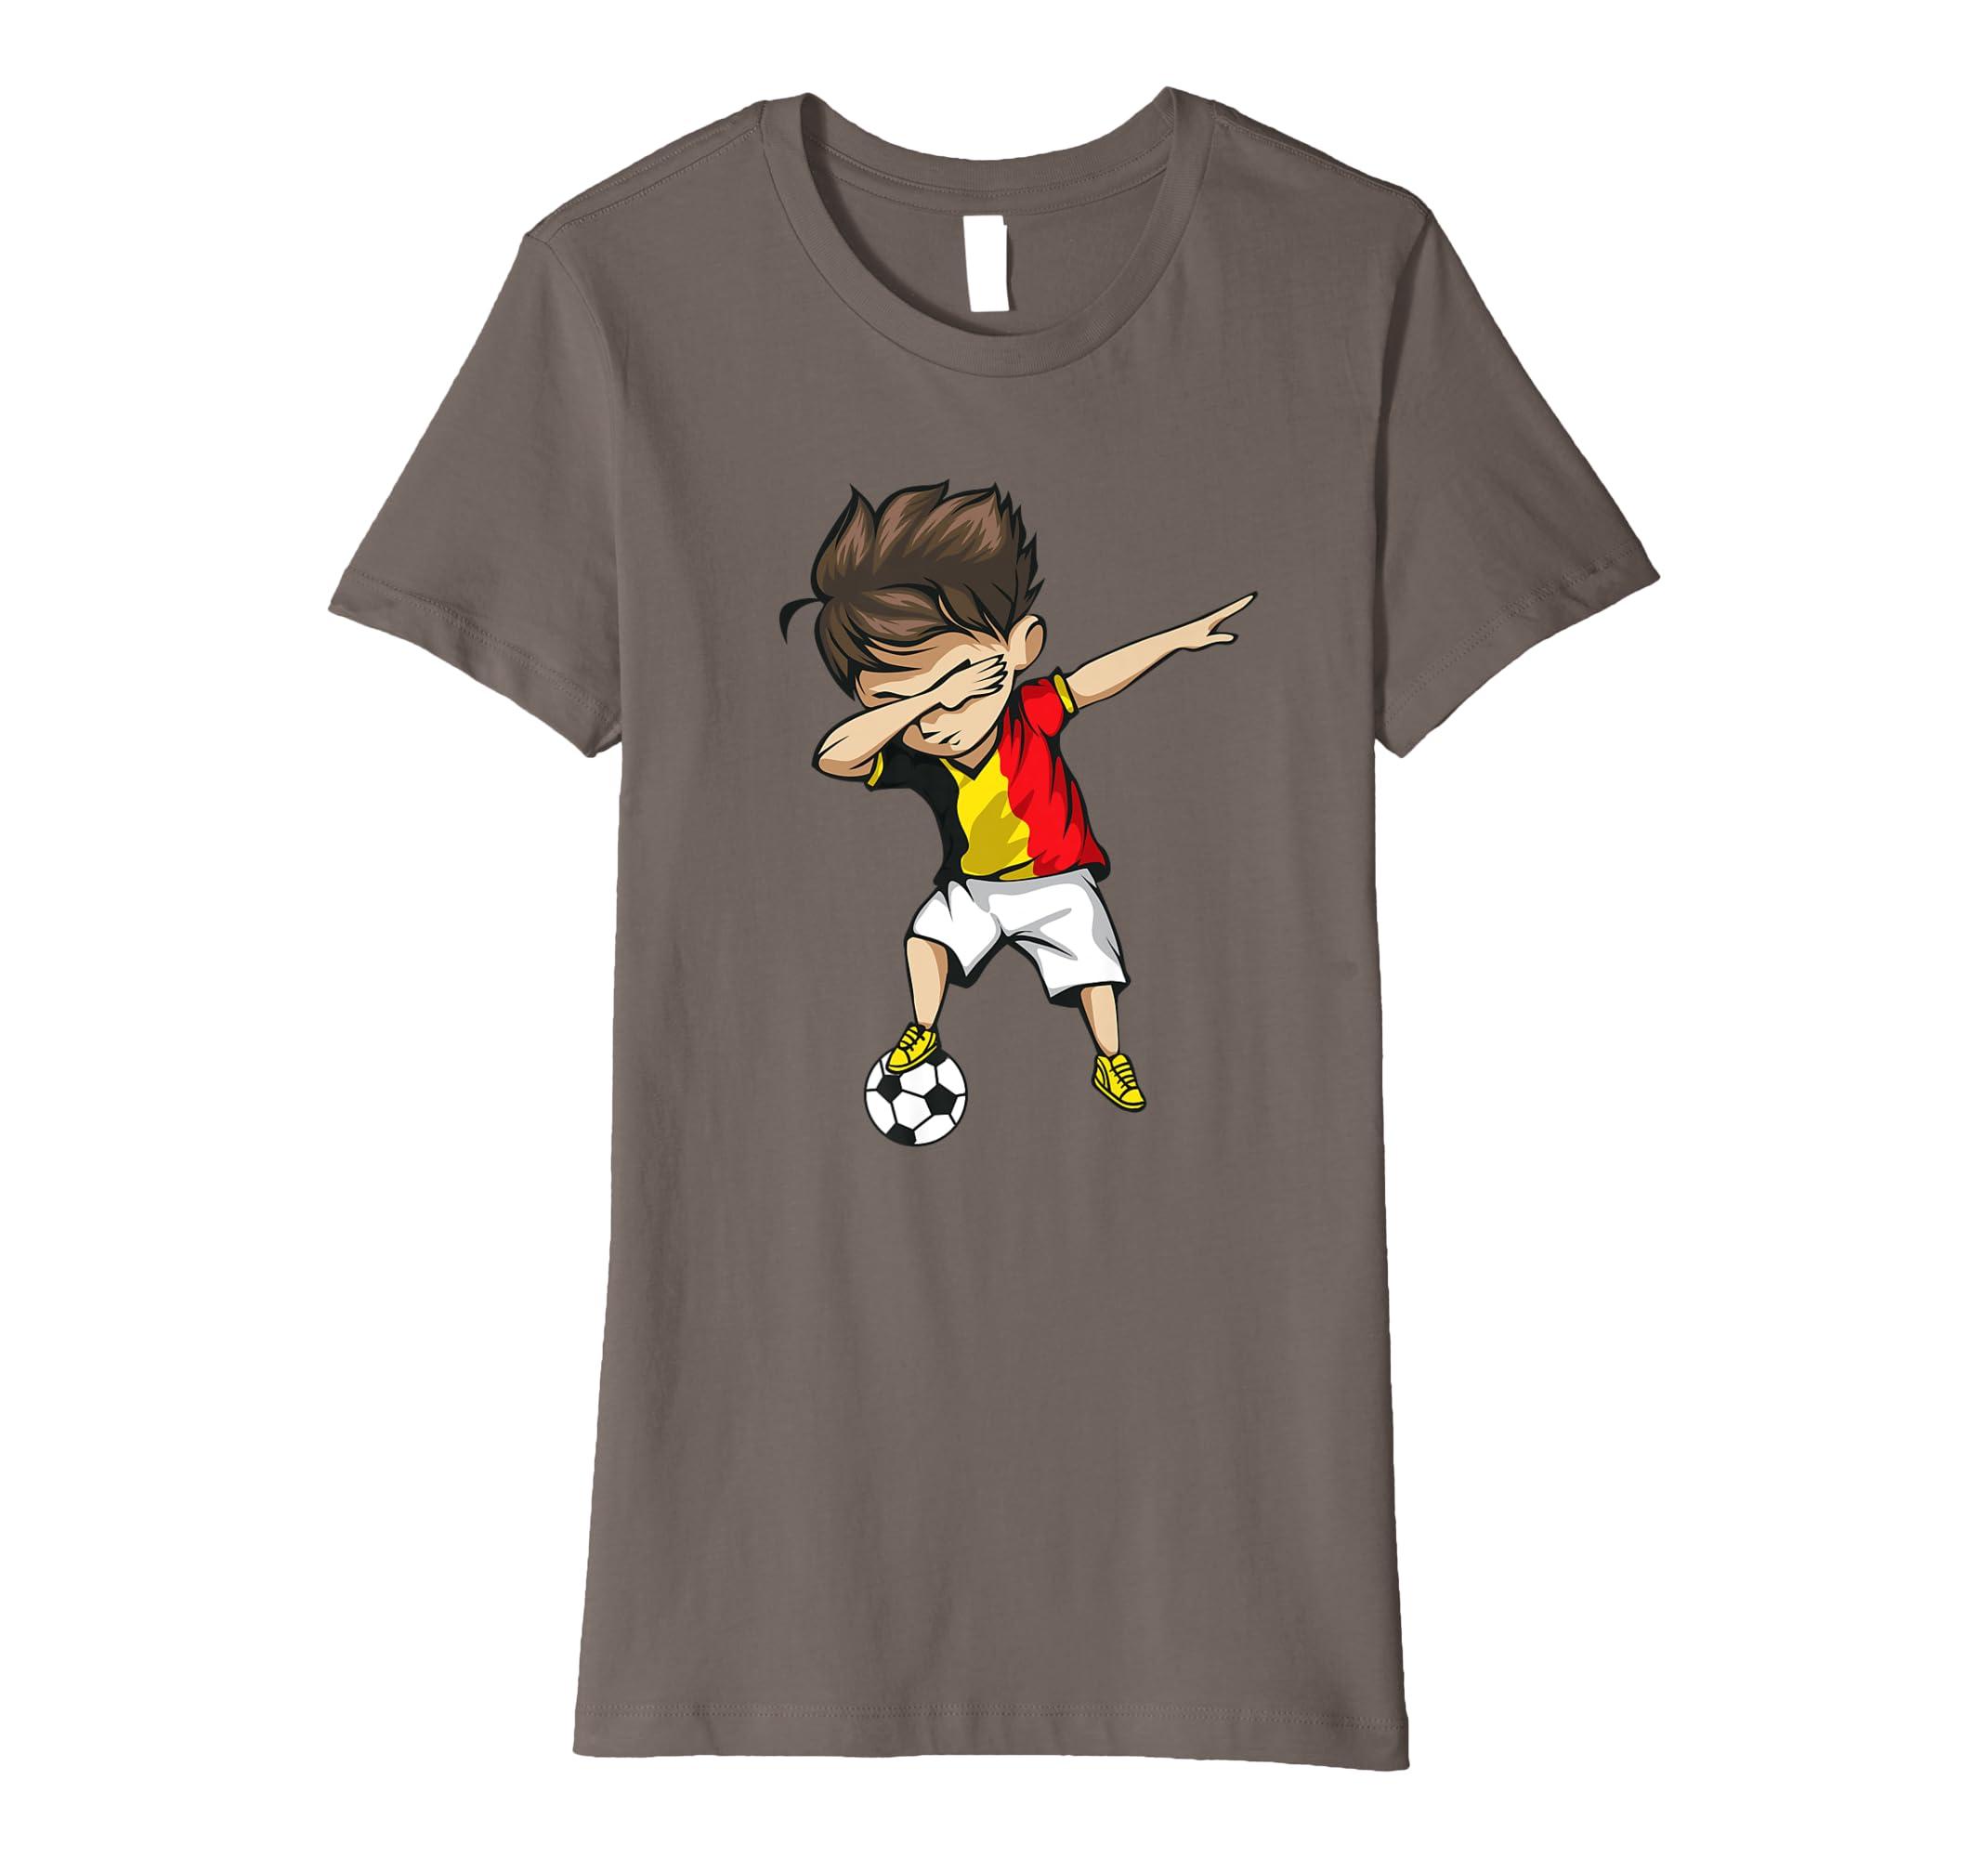 ef18455dba0 Amazon.com: Dabbing Soccer Boy Belgium Jersey Shirt - Belgian Football:  Clothing